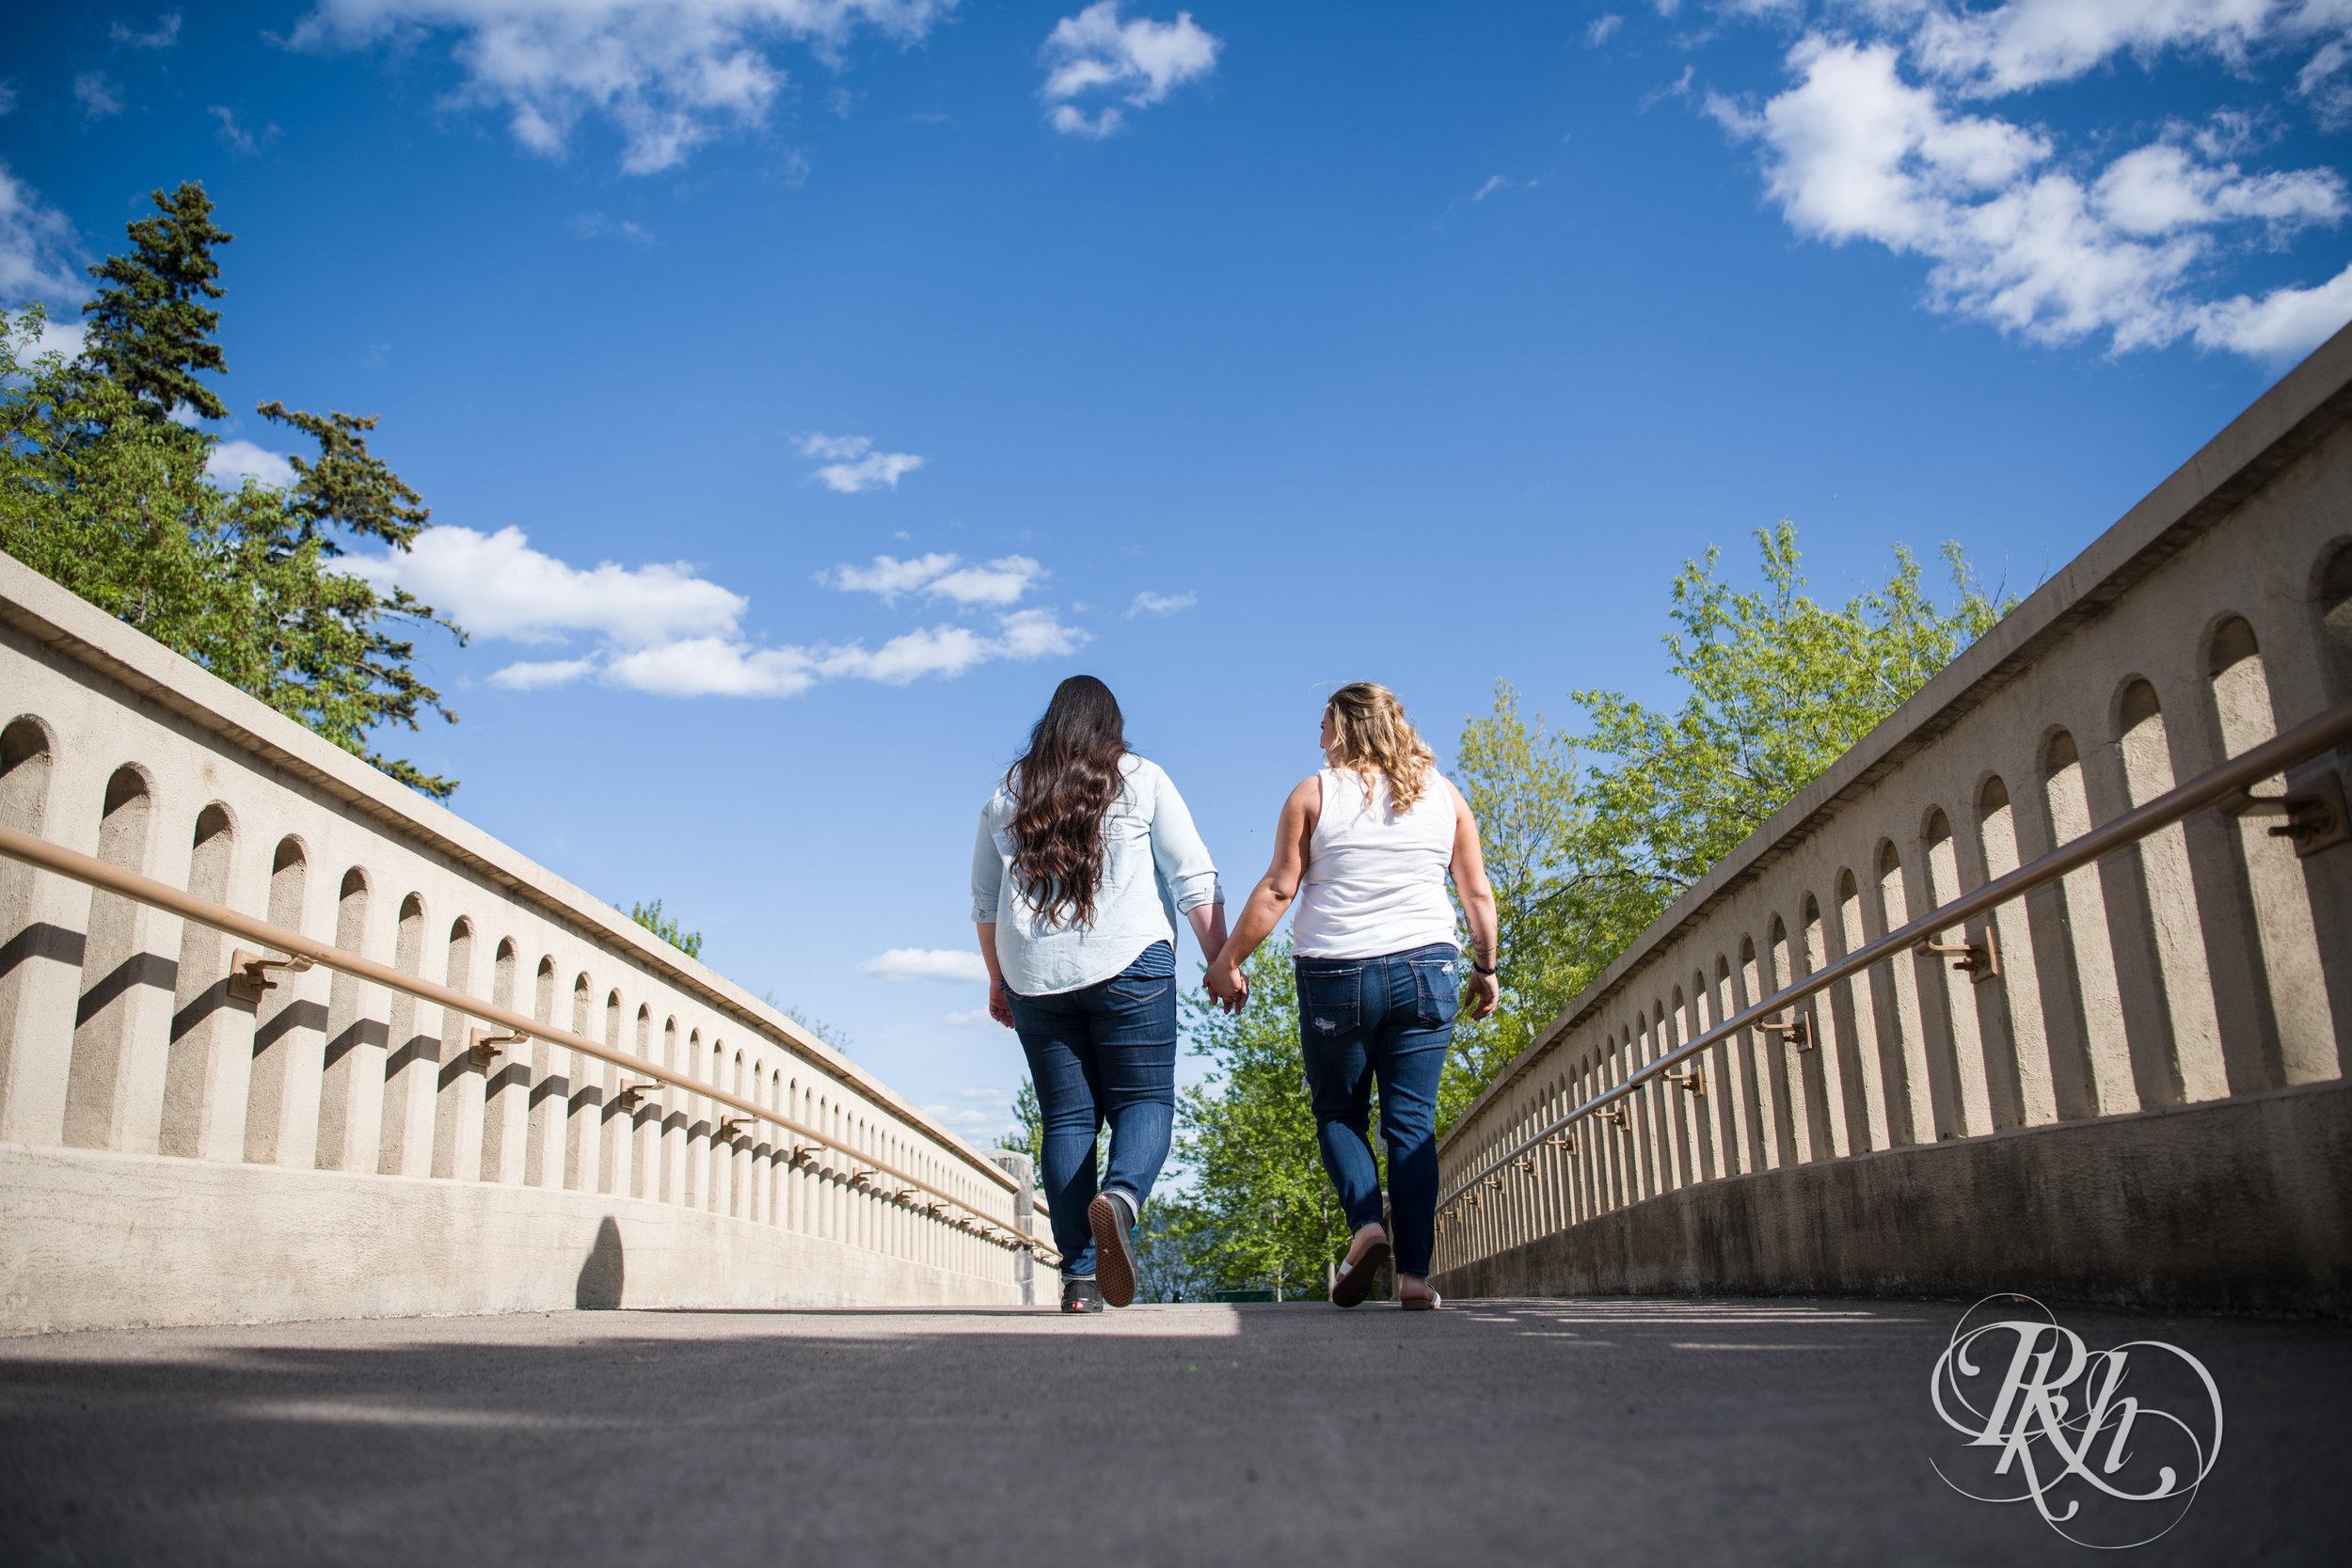 Rose and Yesenia - Minnesota Engagement Photography - Duluth - RKH Images - Blog (1 of 22).jpg